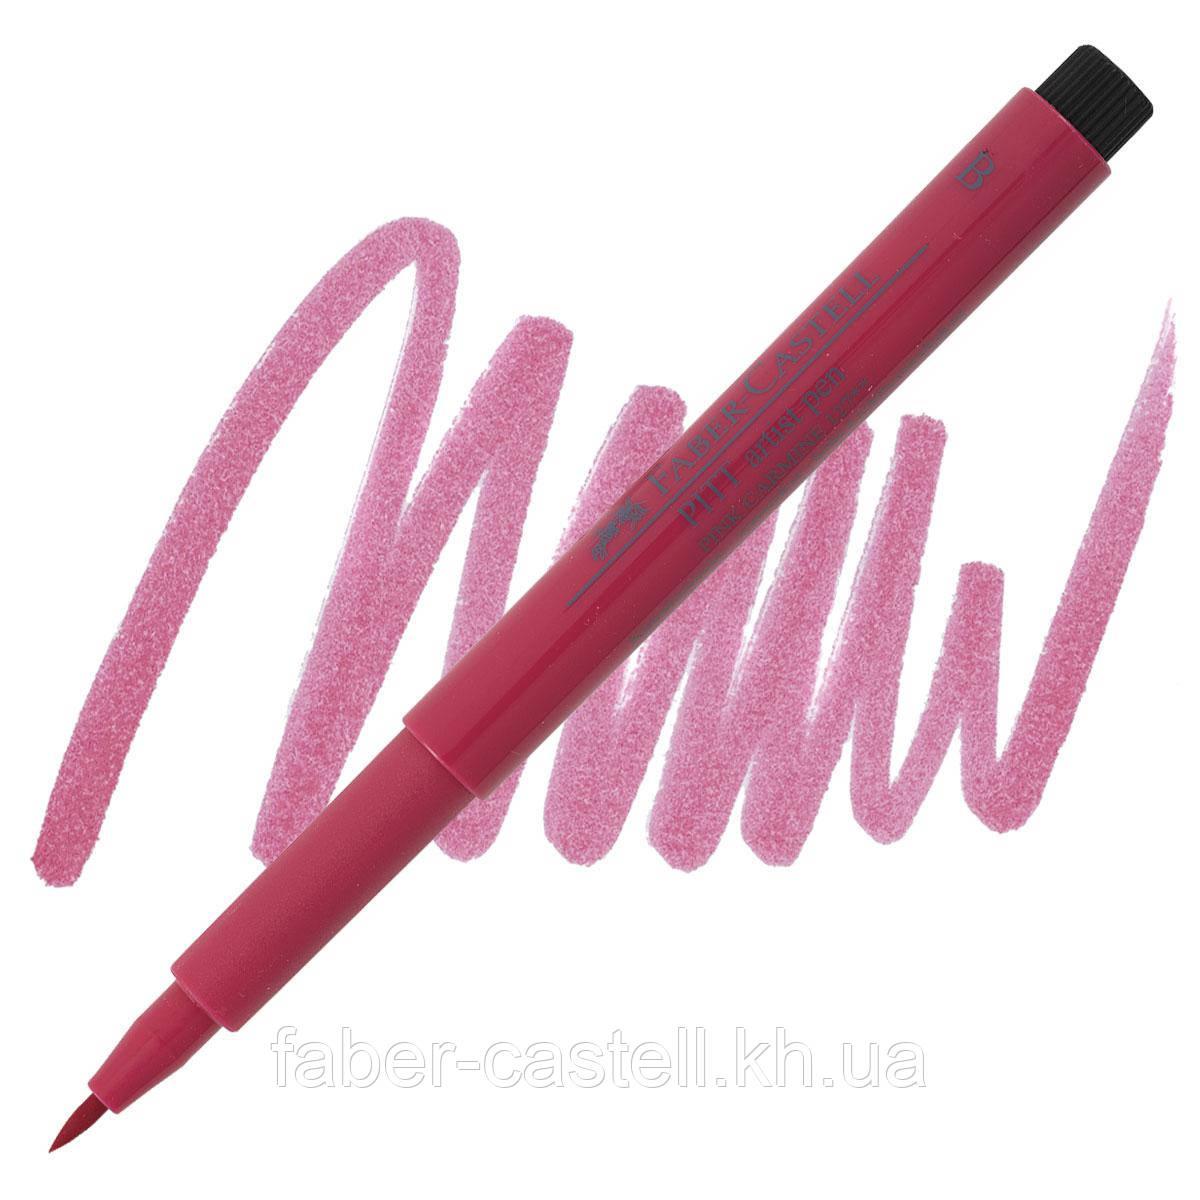 "Ручка-кисточка капиллярная Faber - Castell PITT® ARTIST PEN ""BRUSH"" №127 розовый кармин, 167427"